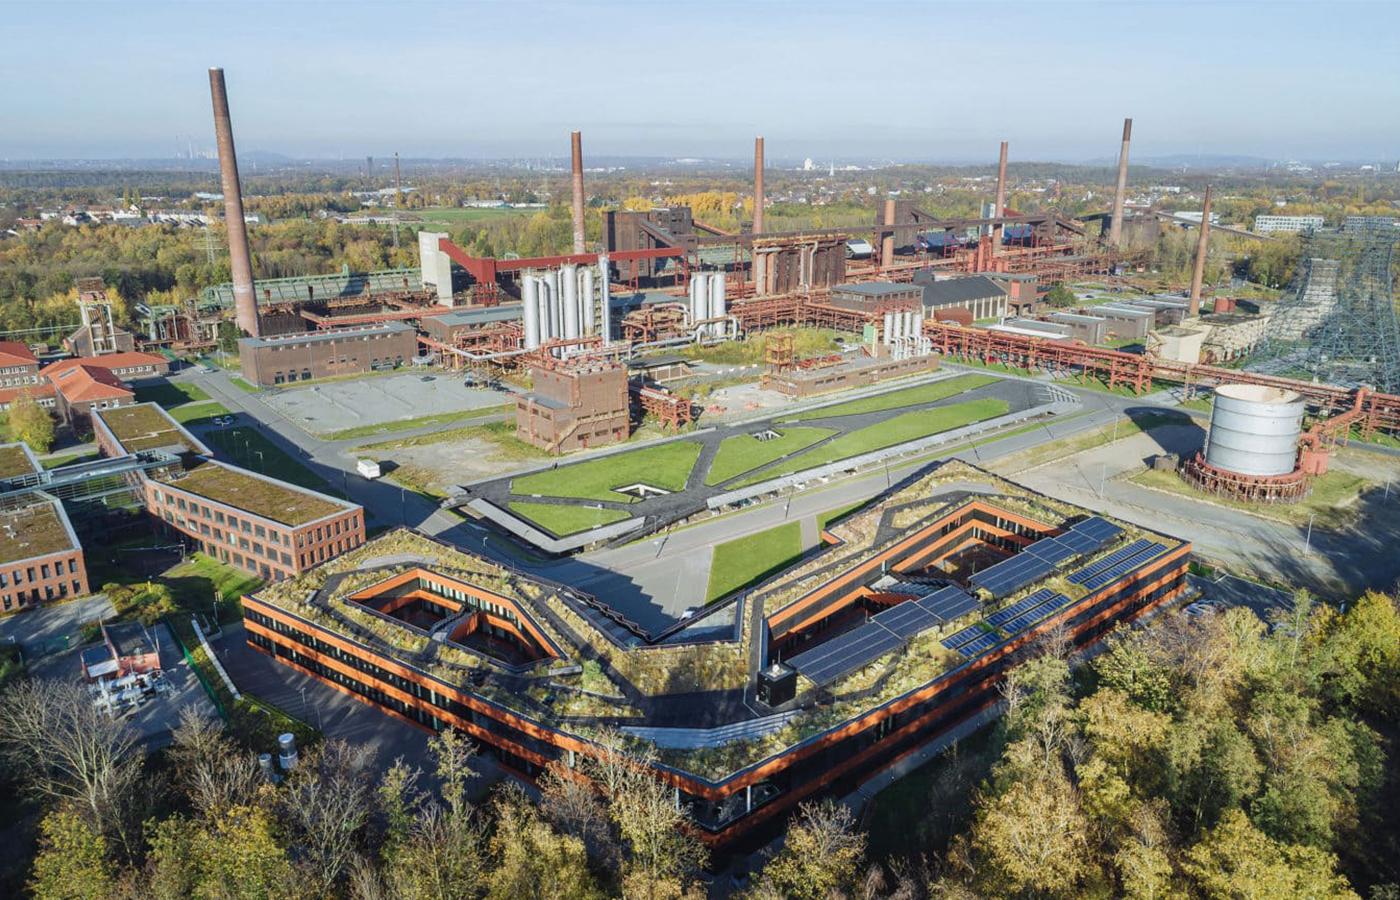 RAG Zeche Zollverein